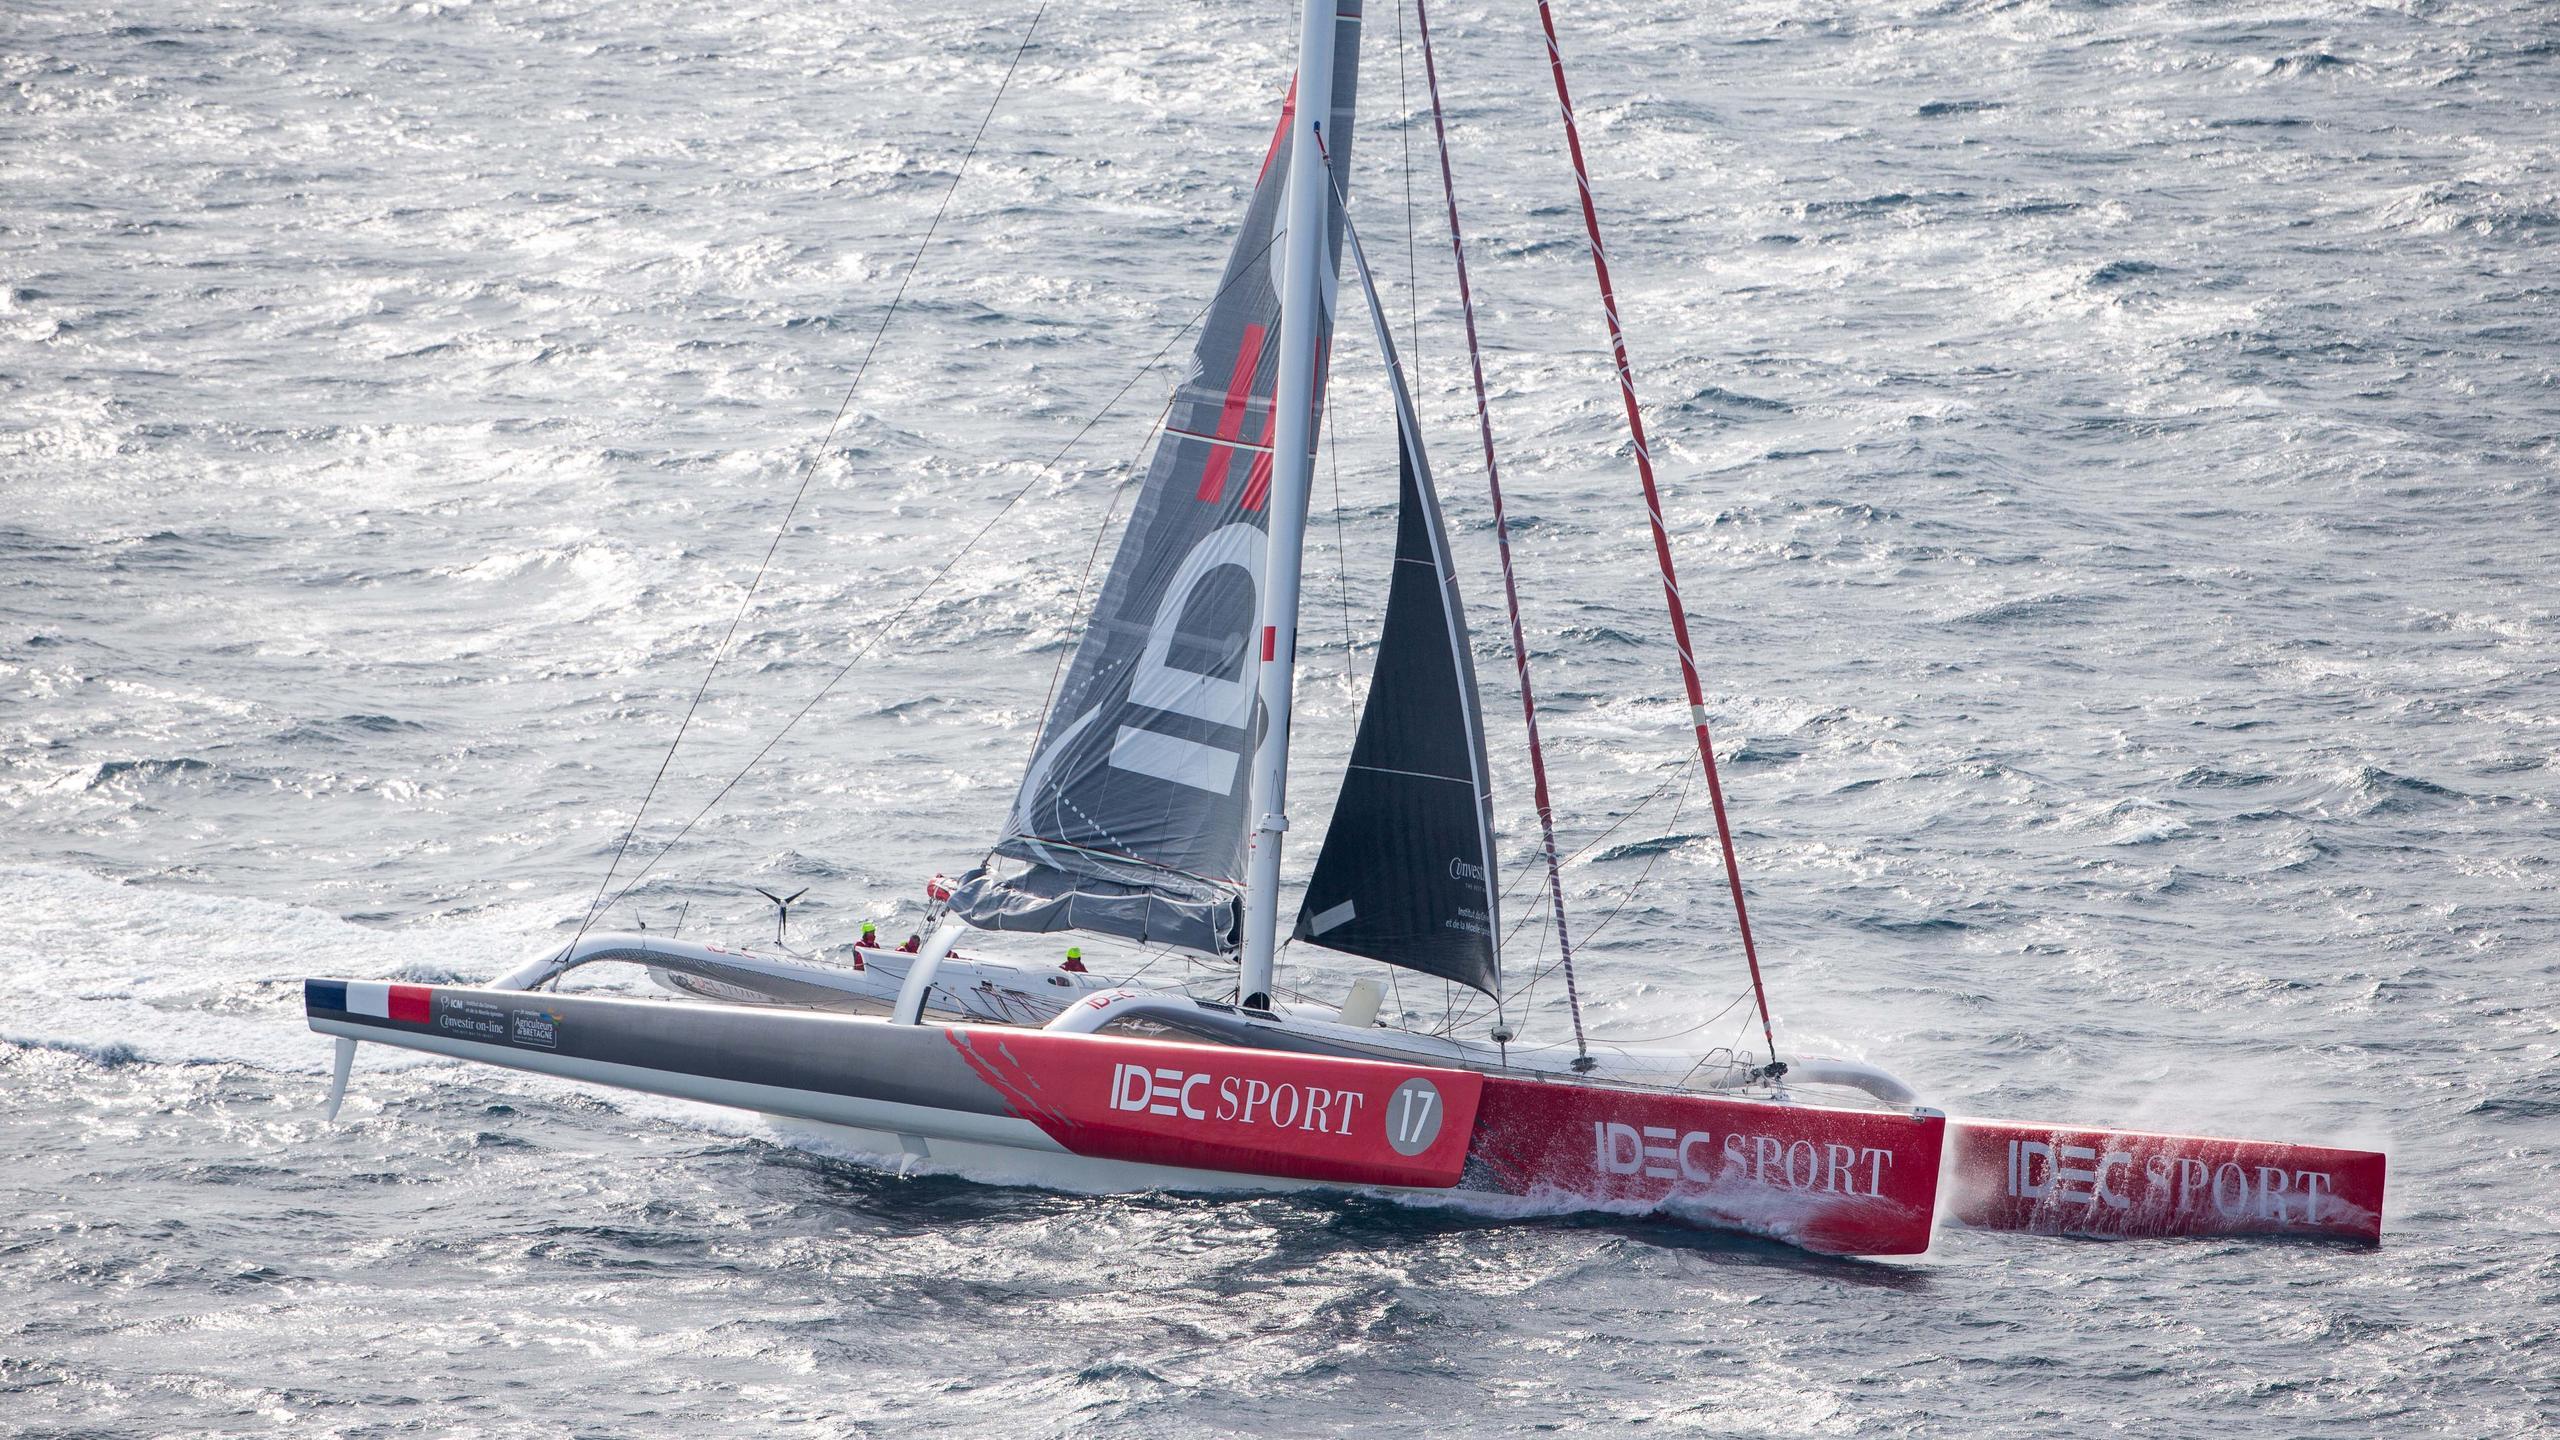 idec sport trimaran racing yacht multiplast 2006 31m half profile